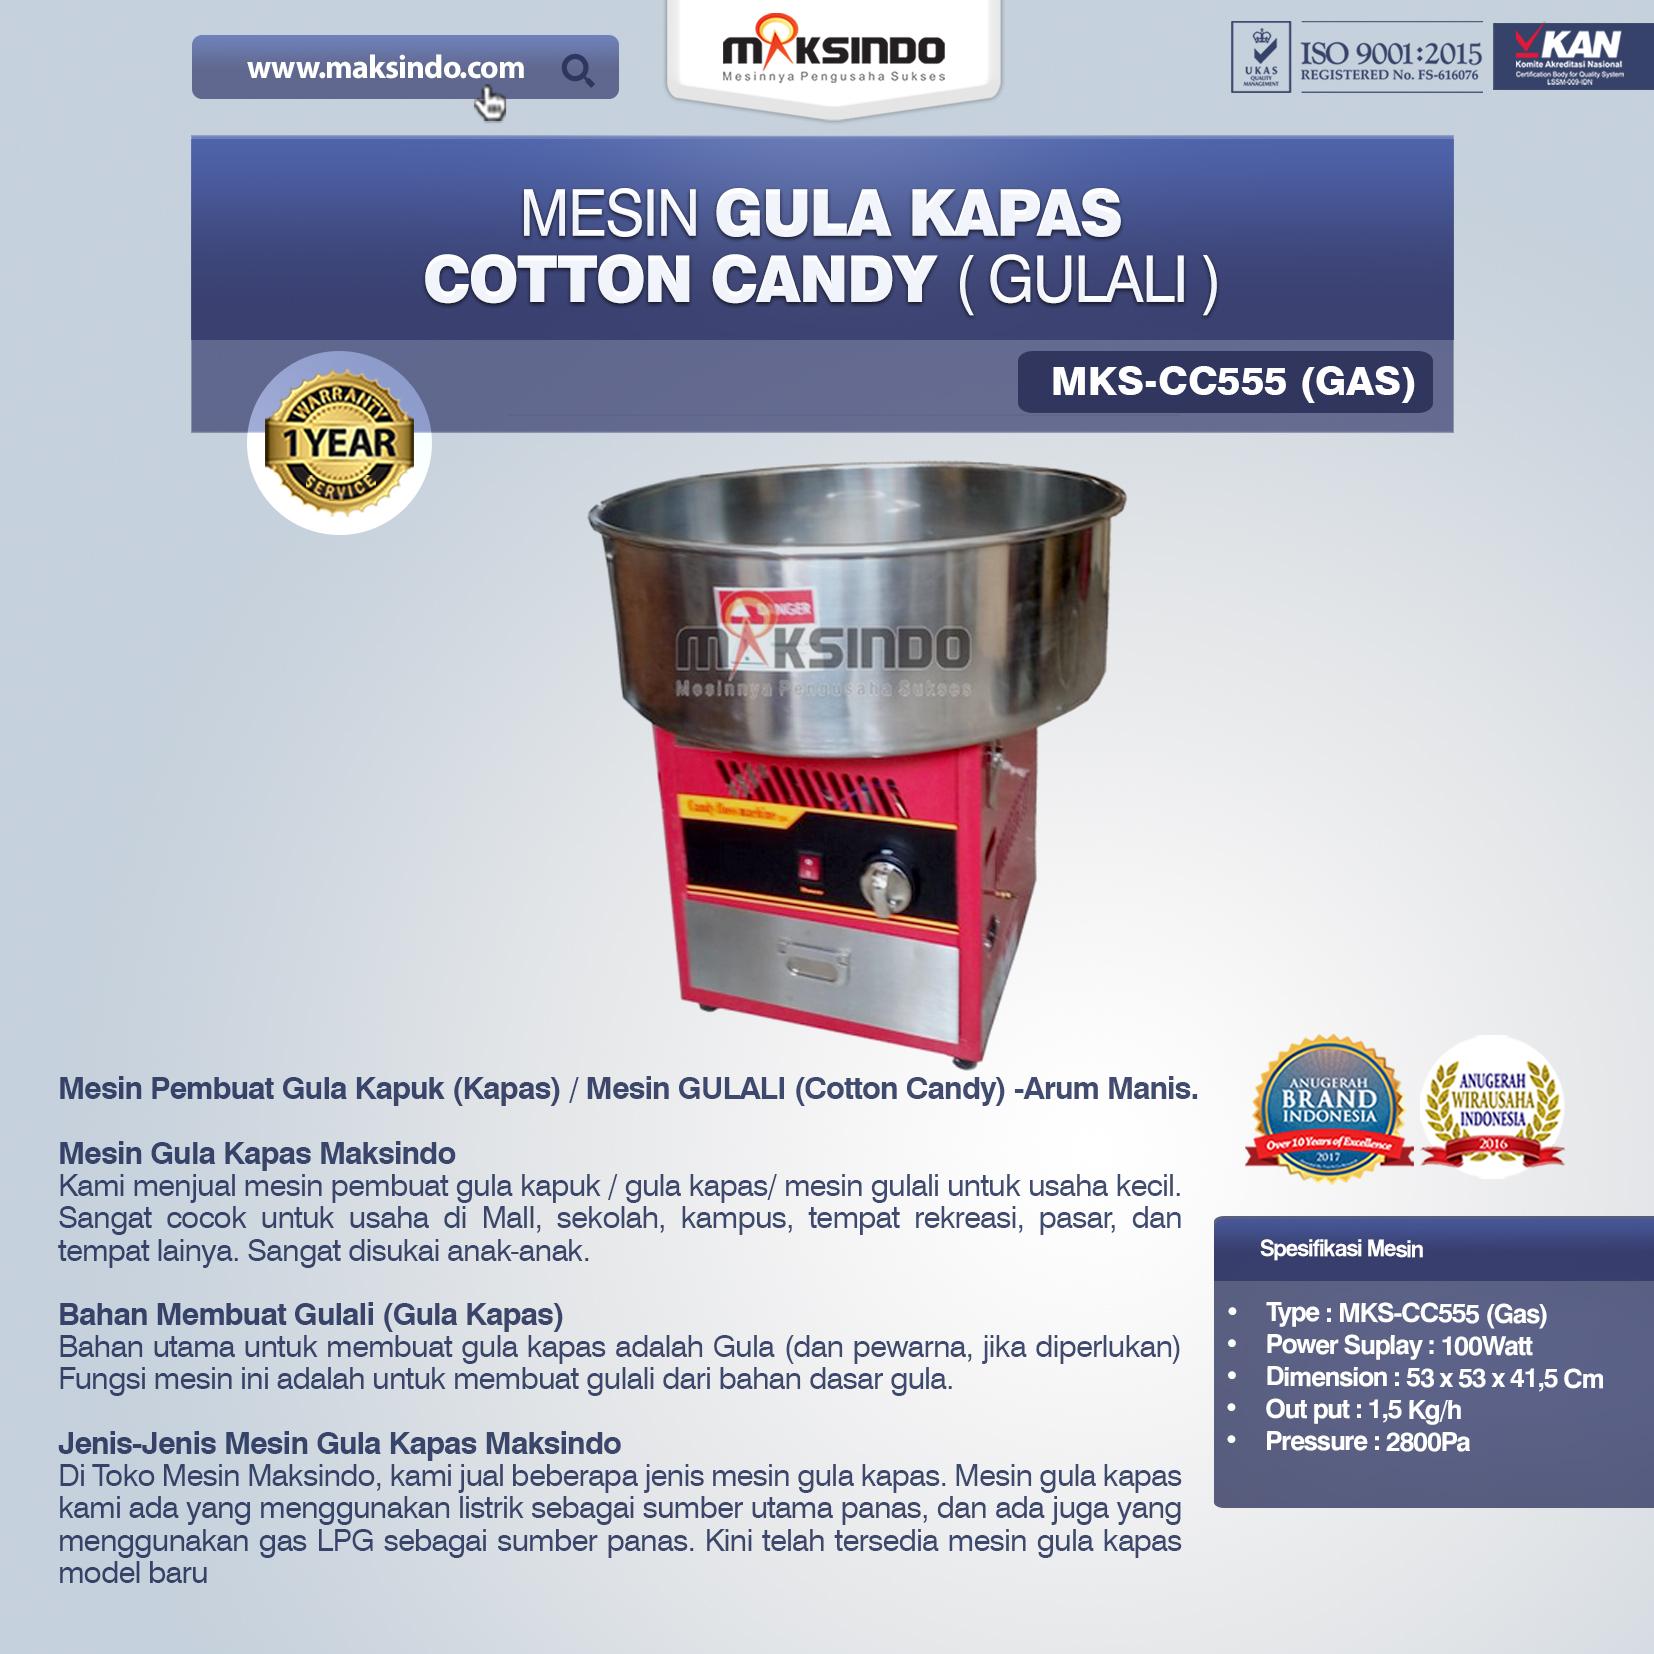 Jual Mesin Gula Kapas Cotton Candy (Gulali) di Palembang